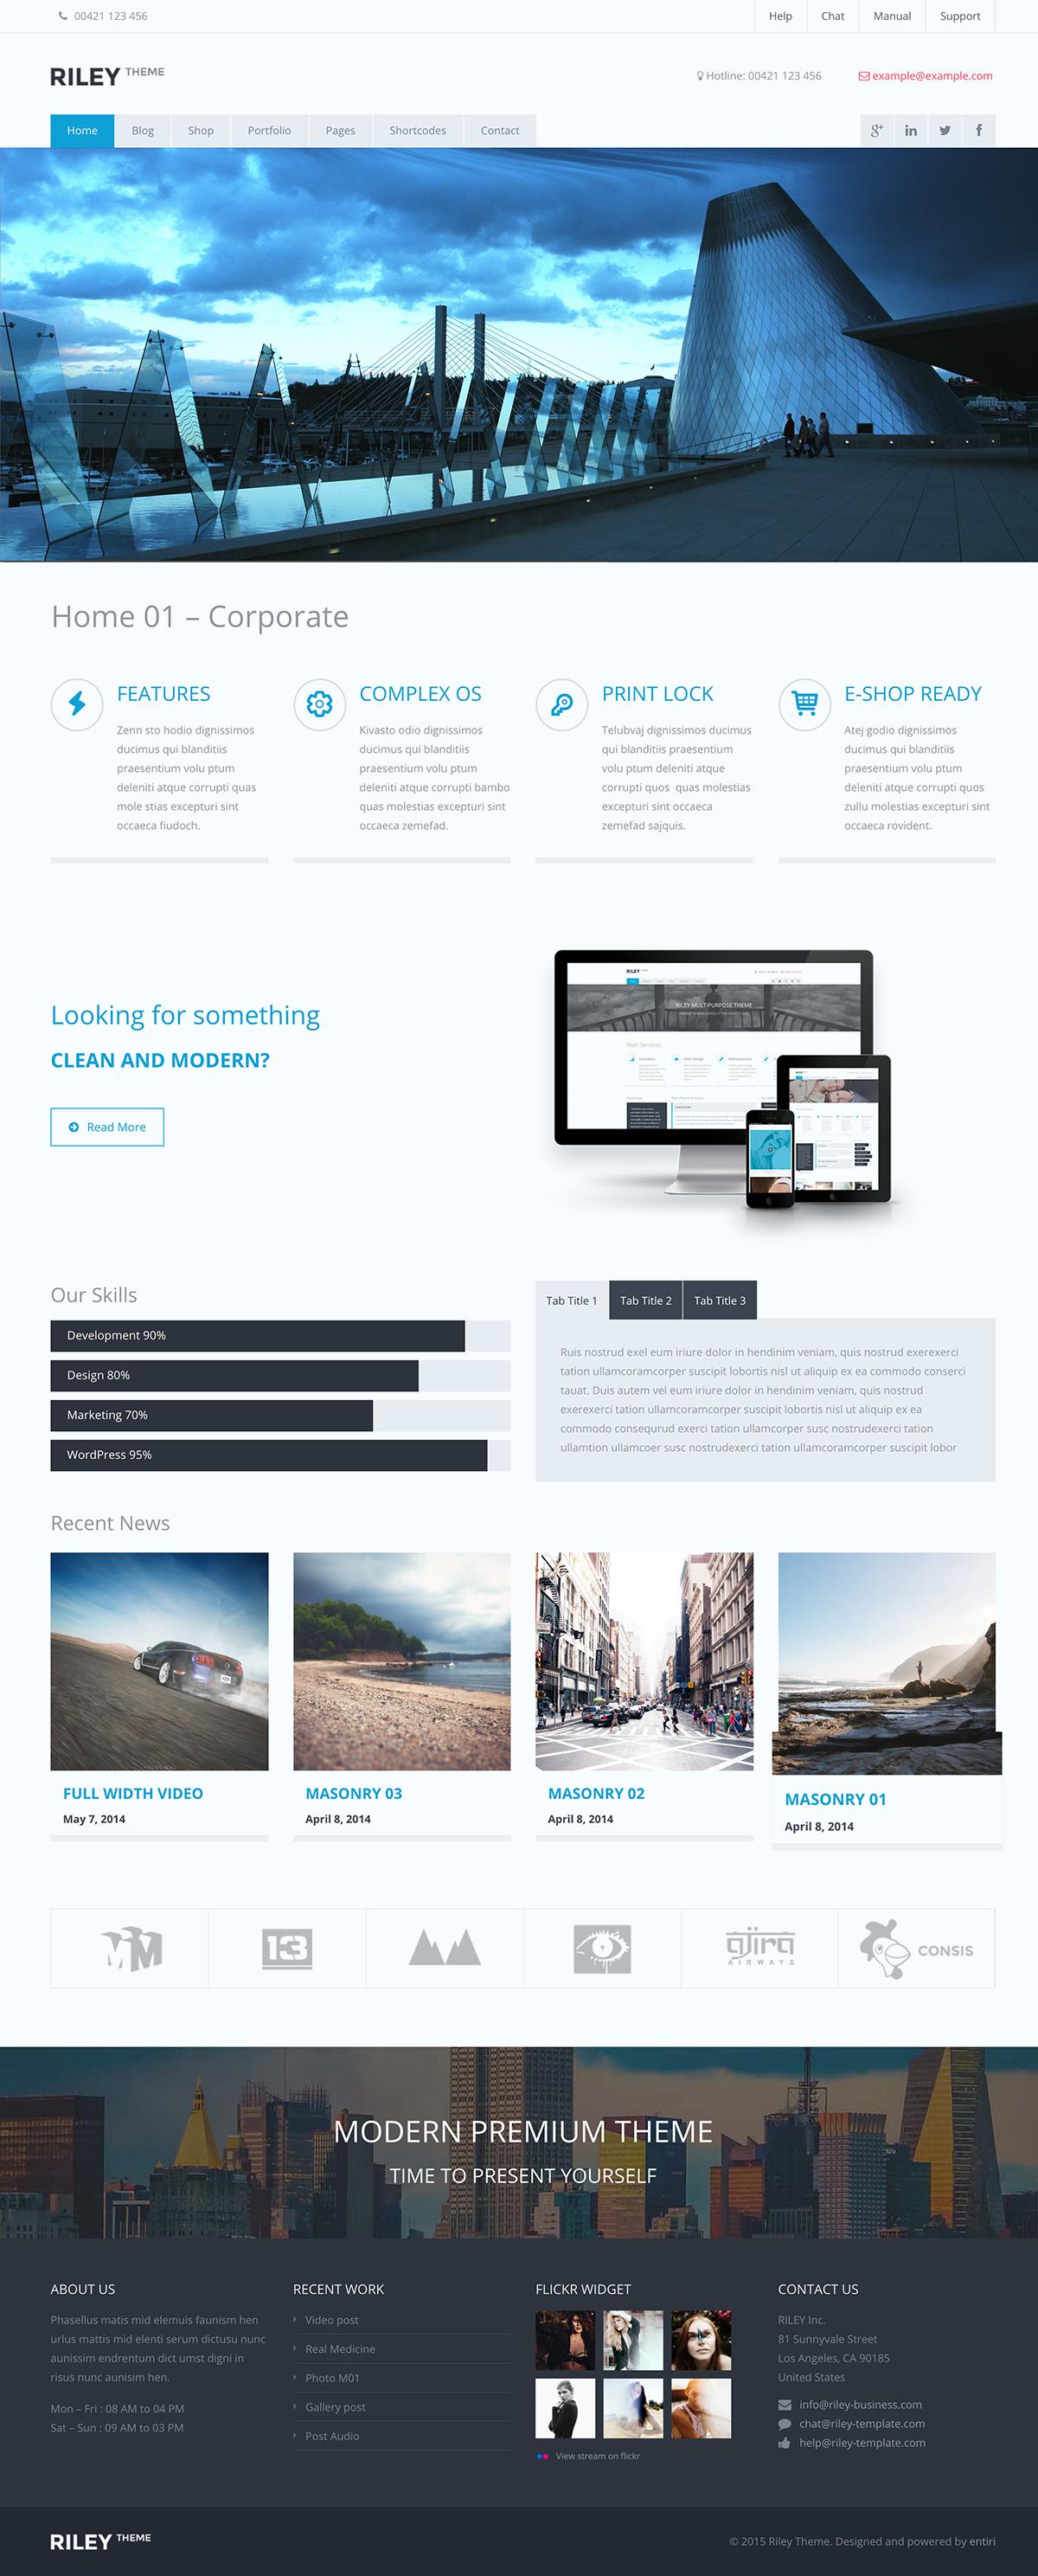 RILEY Corporate Multi Purpose WordPress ThemeRILEY Corporate Multi Purpose WordPress Theme copy